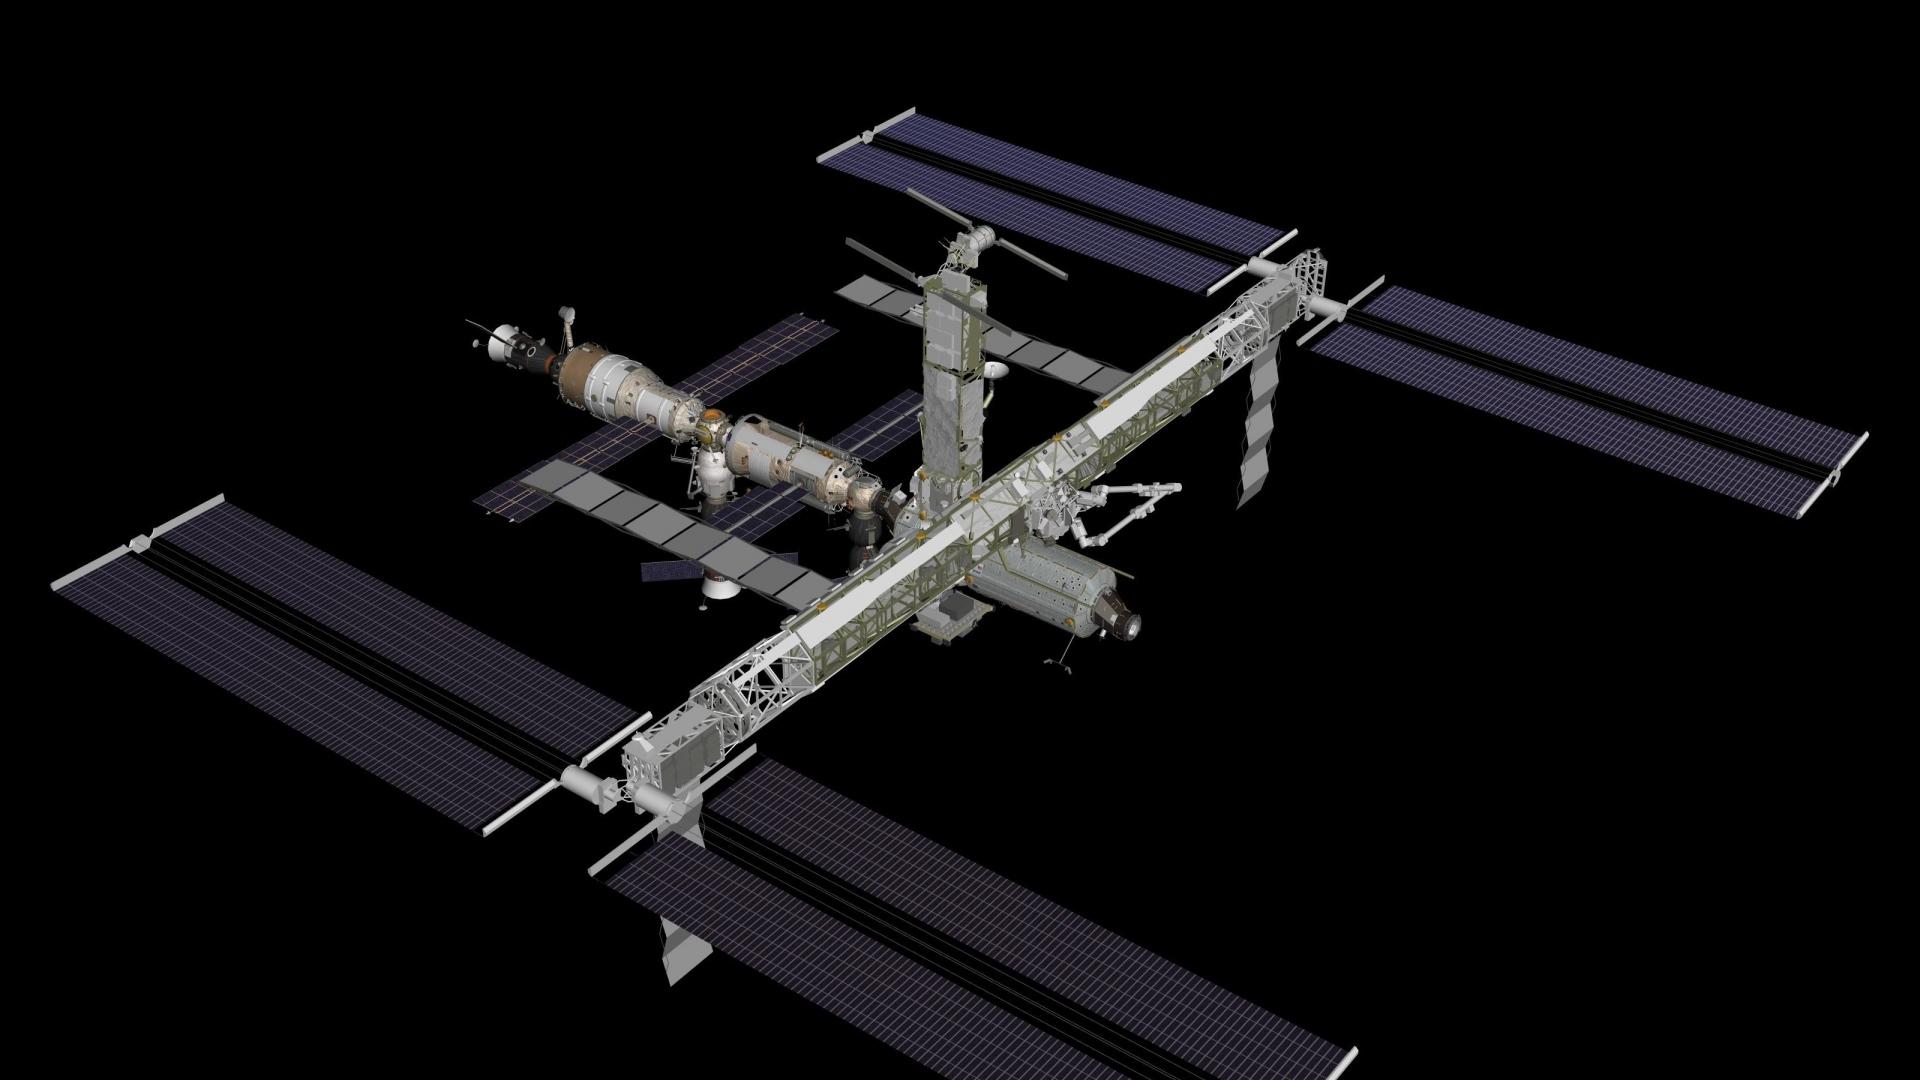 station_weightlessness_study_63644_1920x1080.jpg